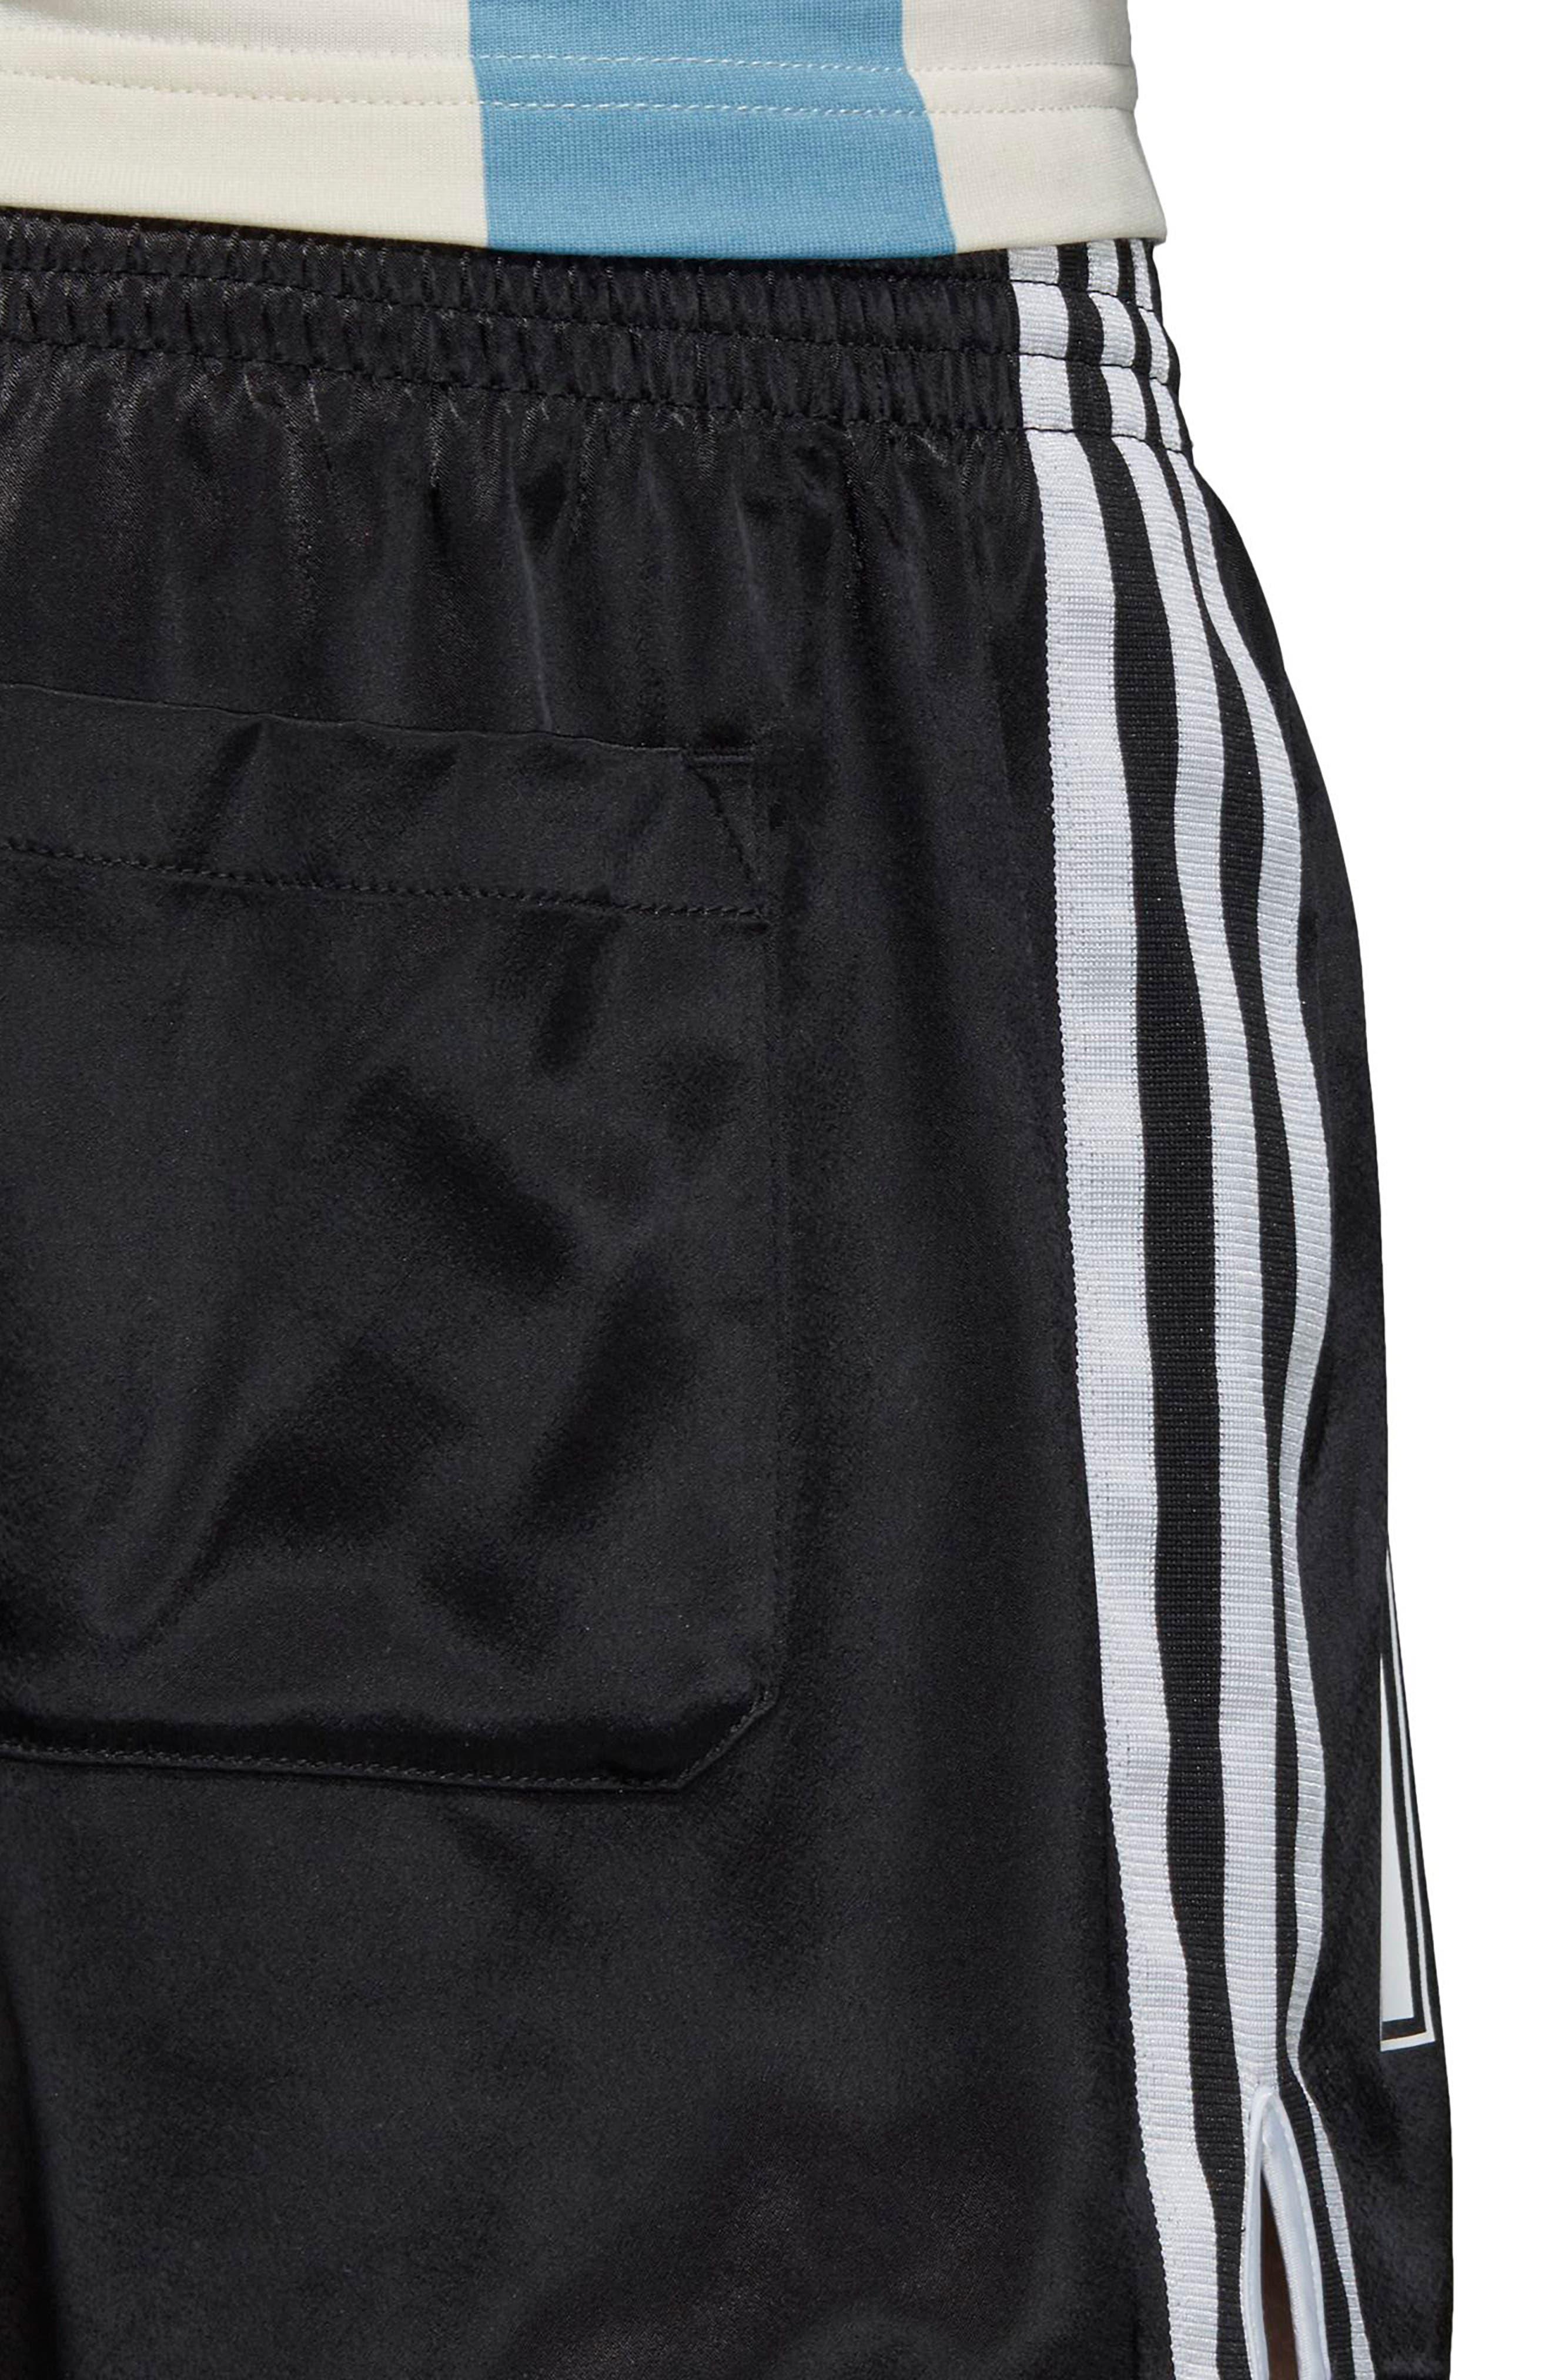 adidas Original Argentina 1987 Shorts,                             Alternate thumbnail 4, color,                             Black